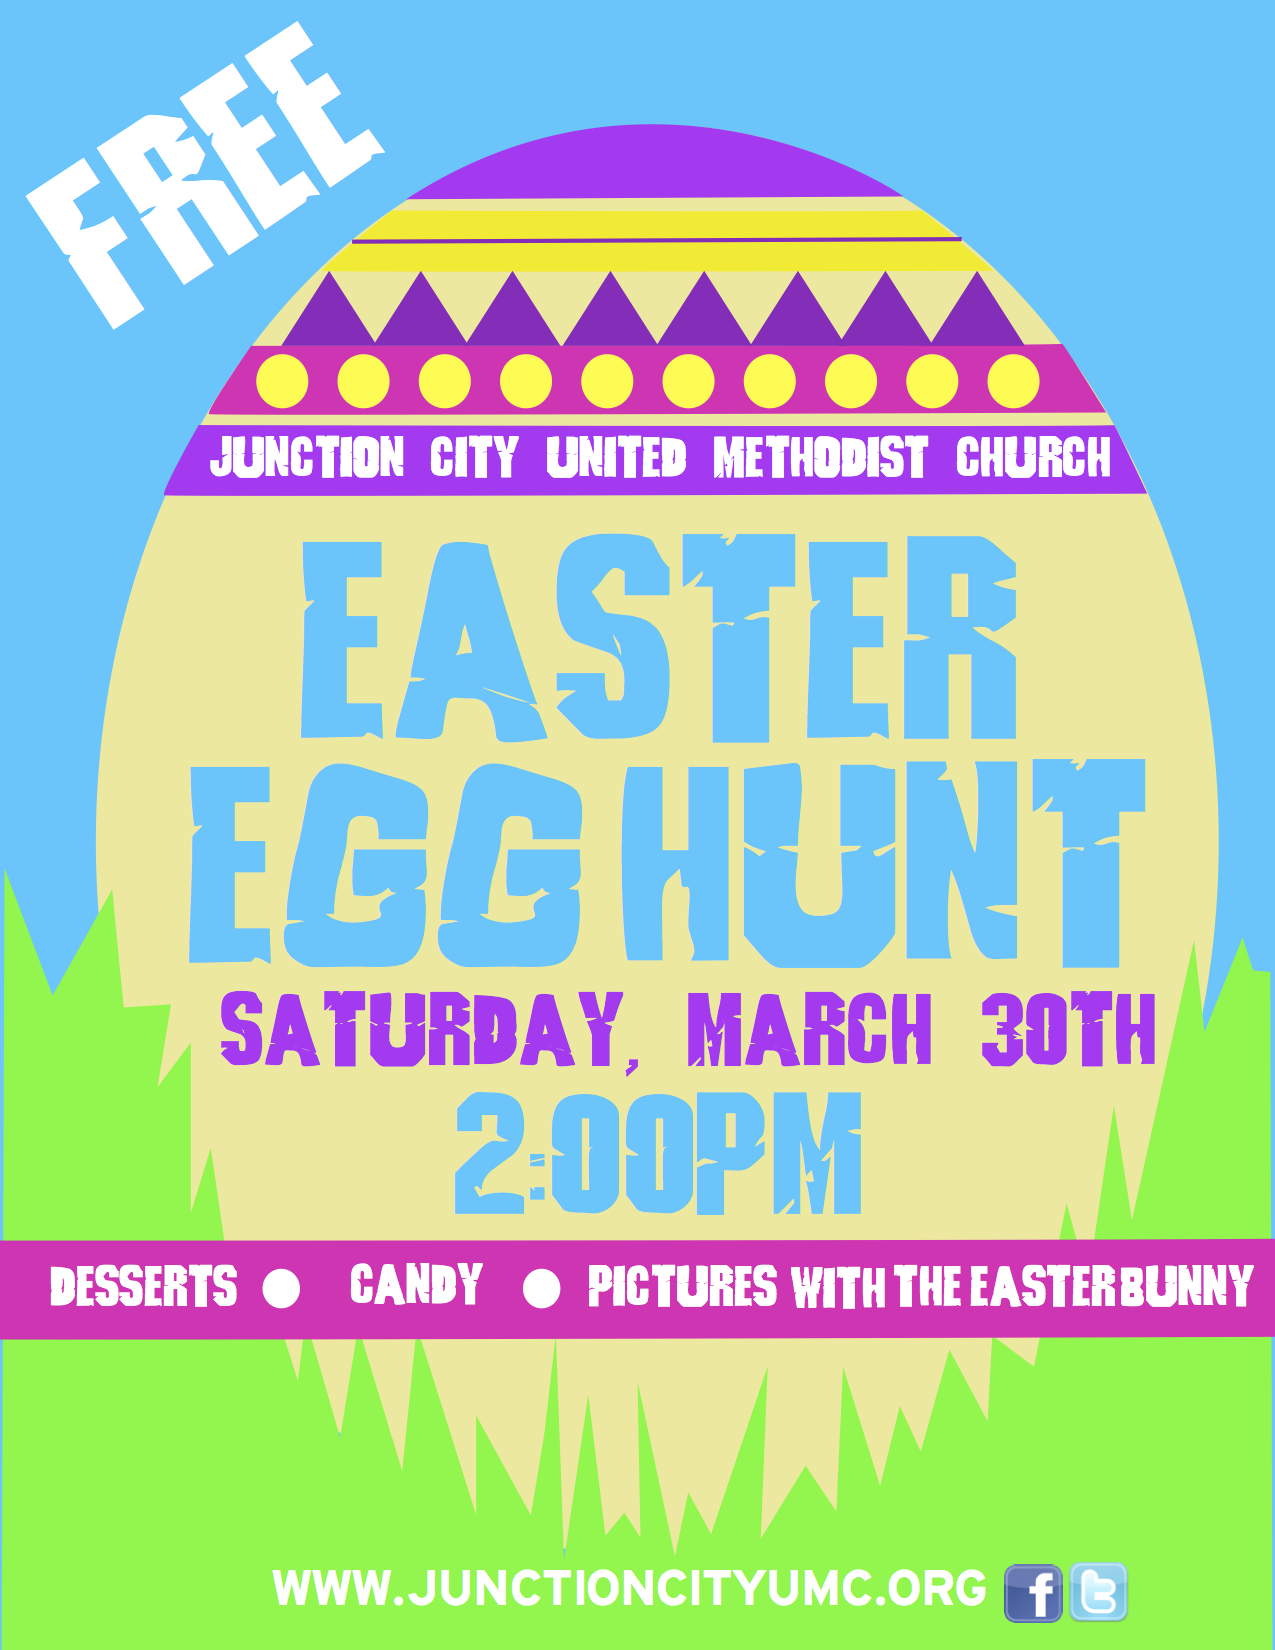 Easter Egg Hunt Template Free from junctionumc.files.wordpress.com